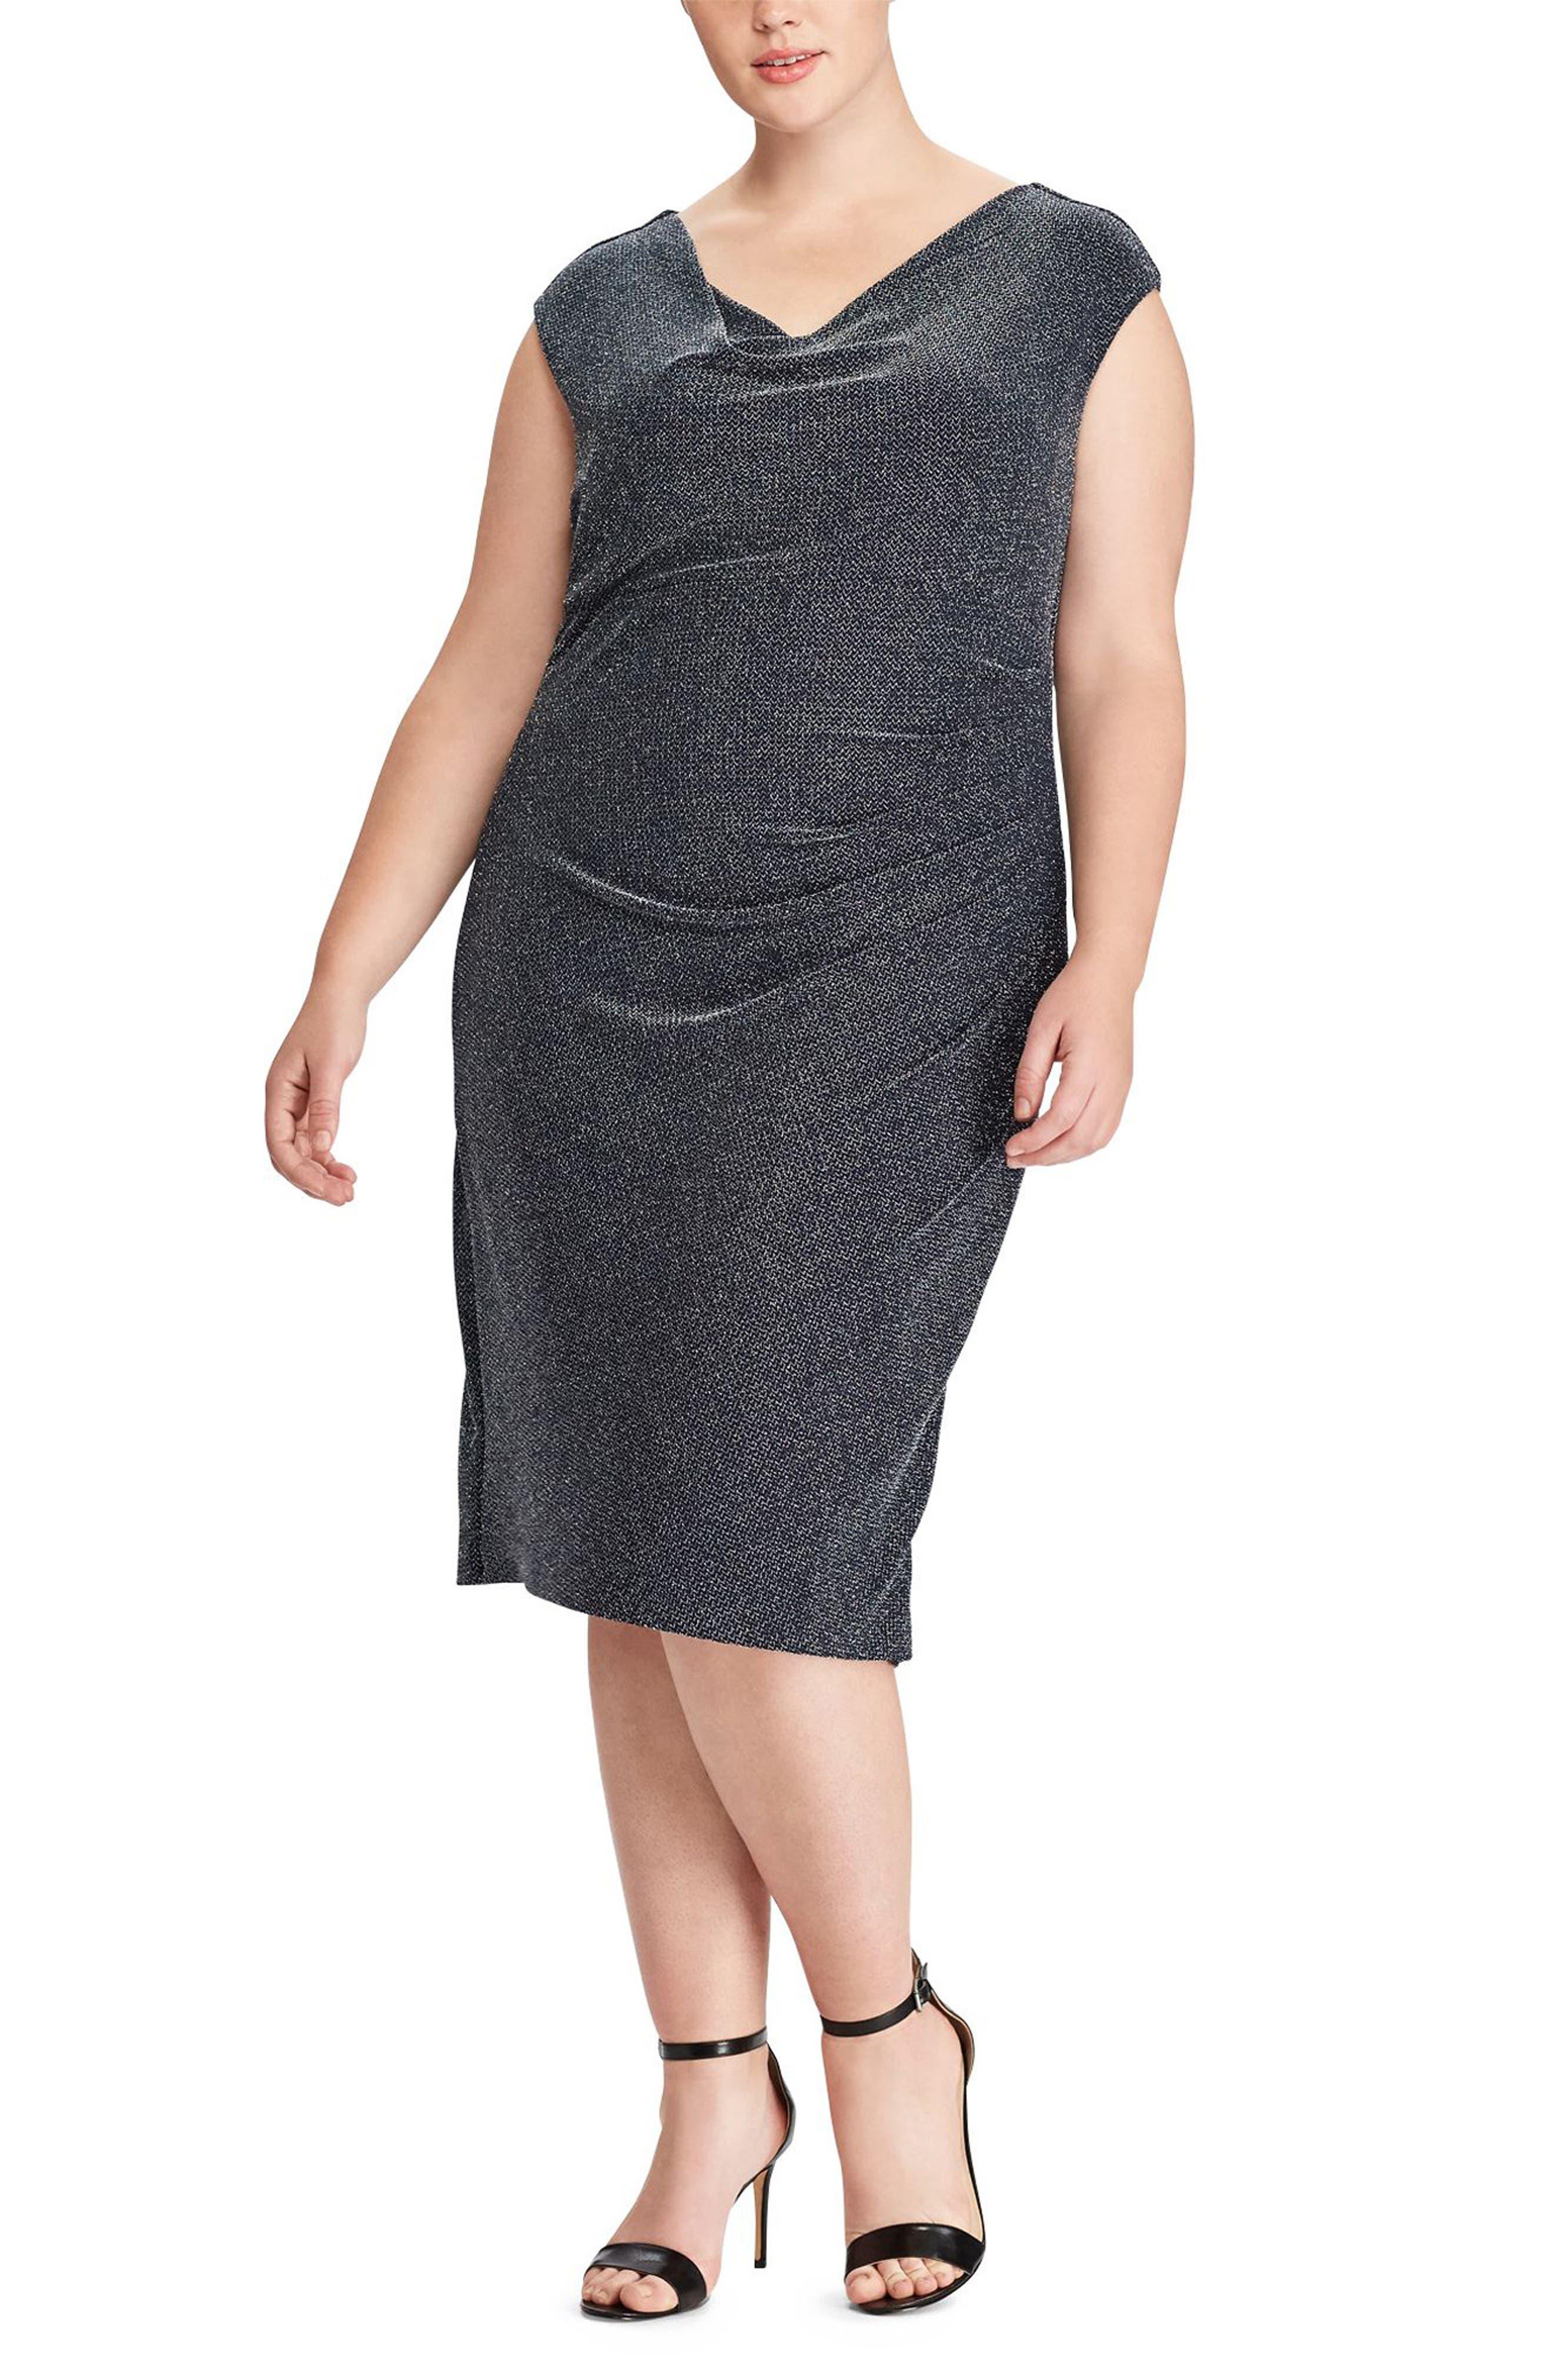 Valli Metallic Knit Dress,                             Main thumbnail 1, color,